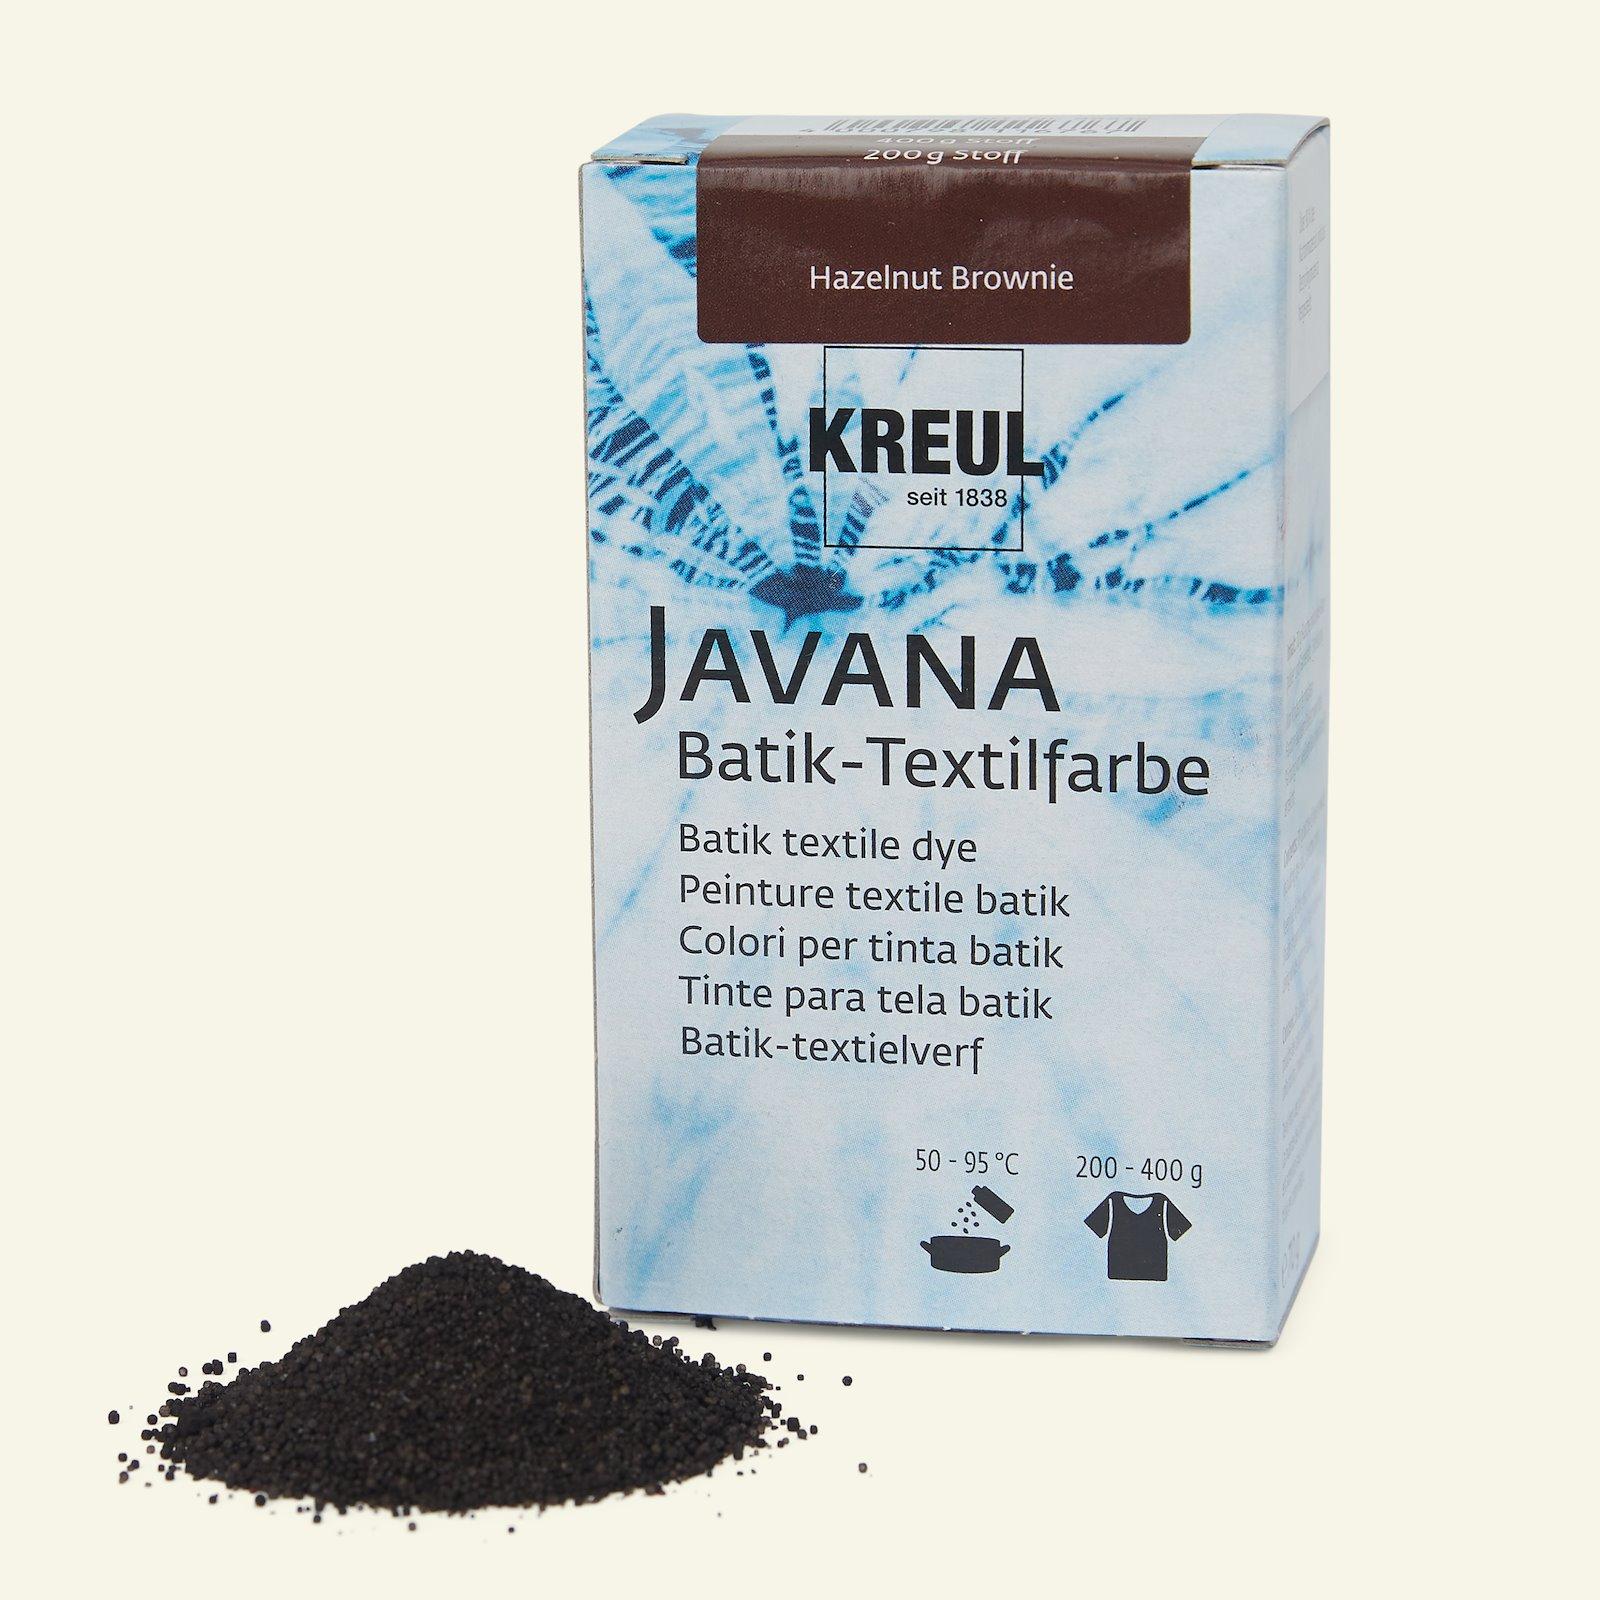 Javana Batikfarbe, Braun, 70g 29673_pack